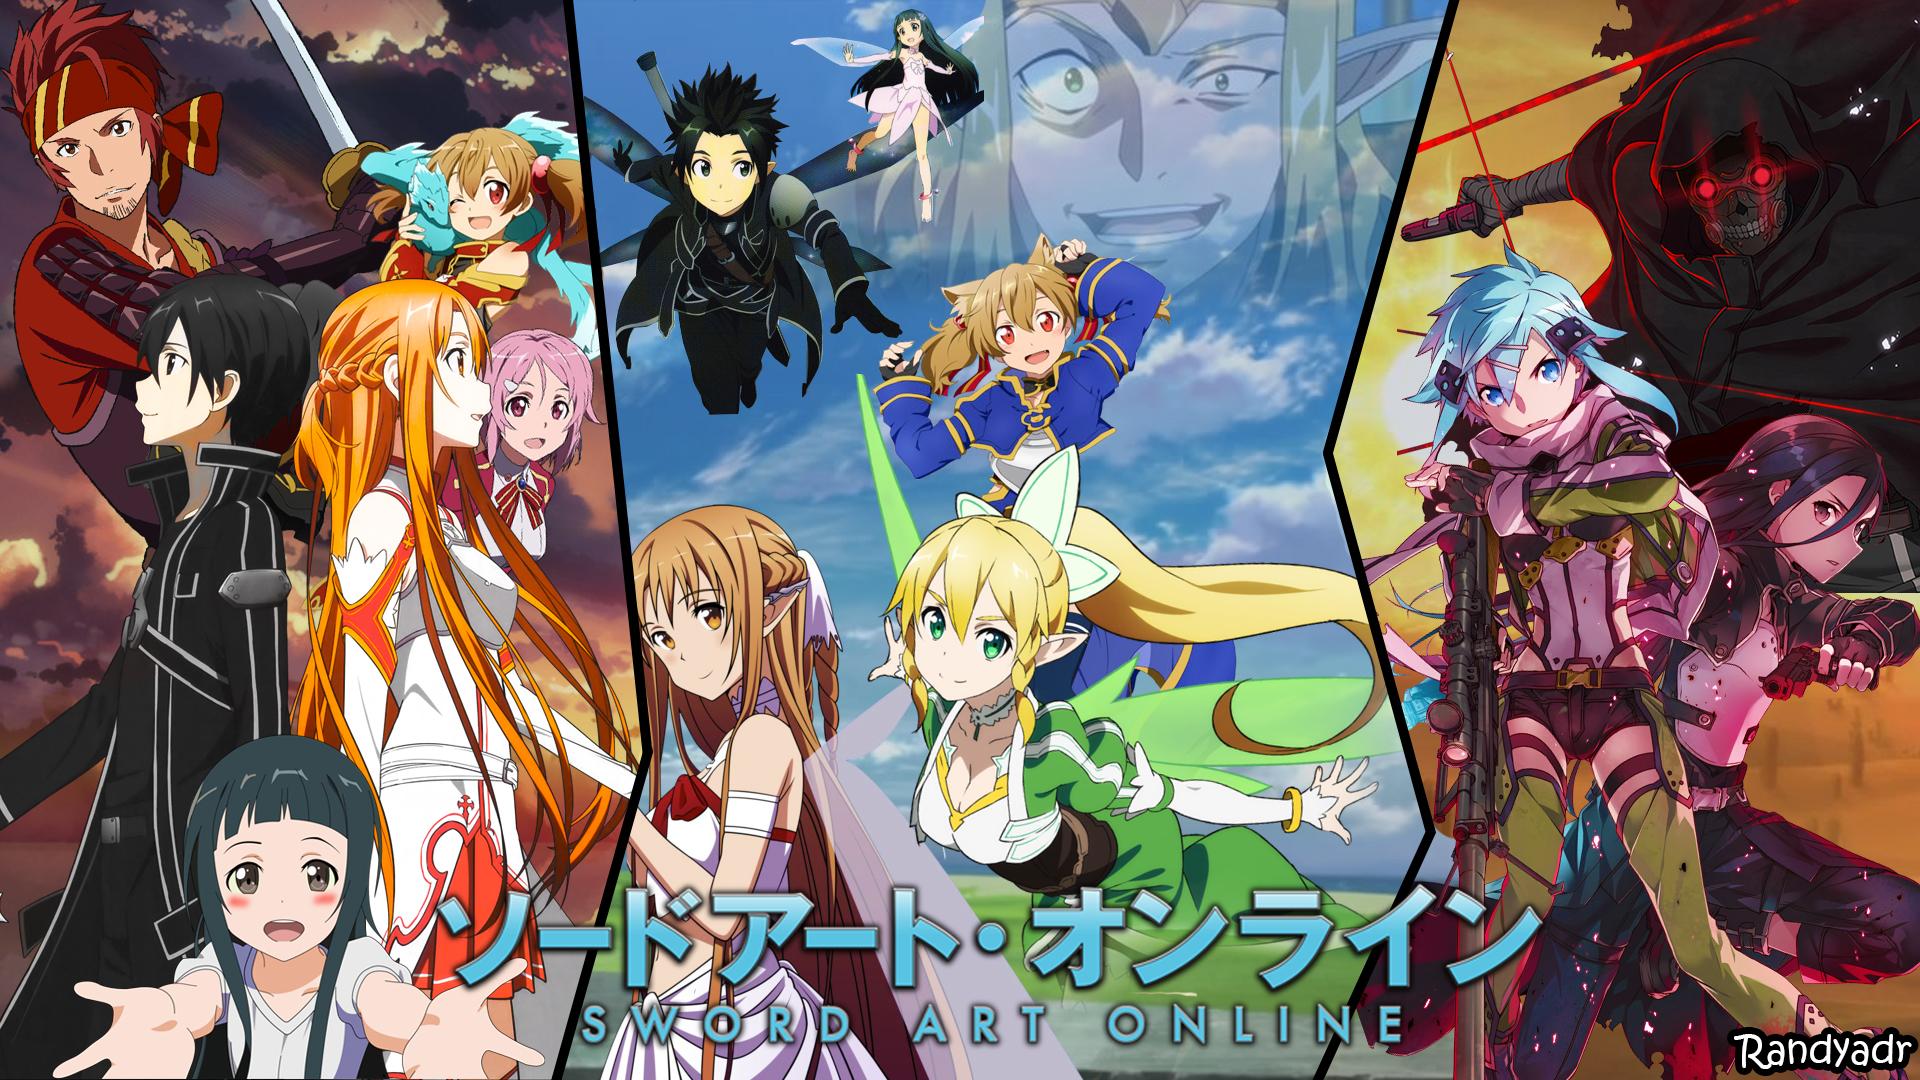 Free Download Sword Art Online Wallpaper Attempt By Randyadr Fan Art Manga Anime 1920x1080 For Your Desktop Mobile Tablet Explore 48 Sword Art Online 2 Wallpaper Sword Art Online